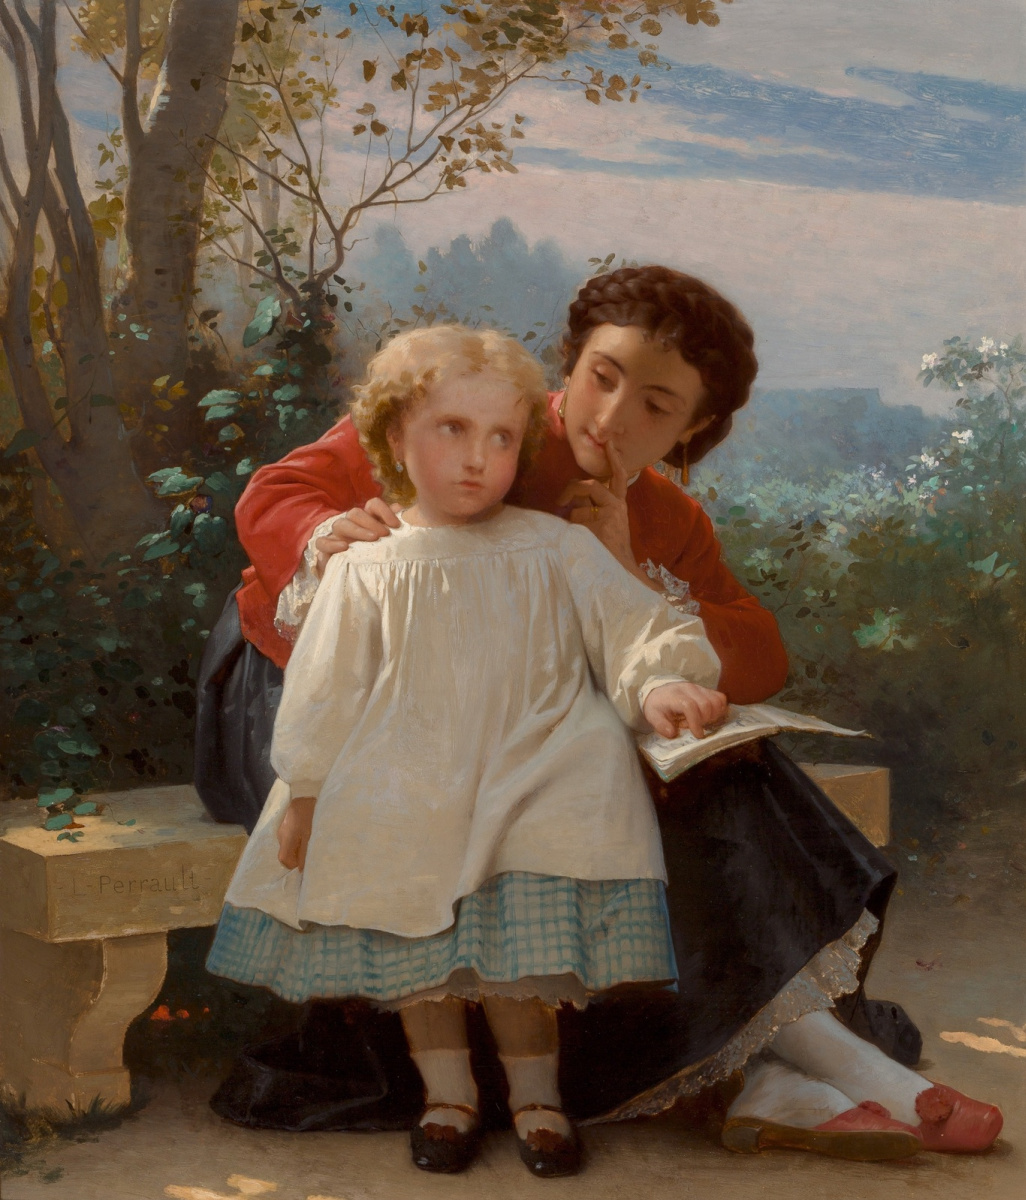 Leon Basile Perrot France 1832-1908. Reading lesson.